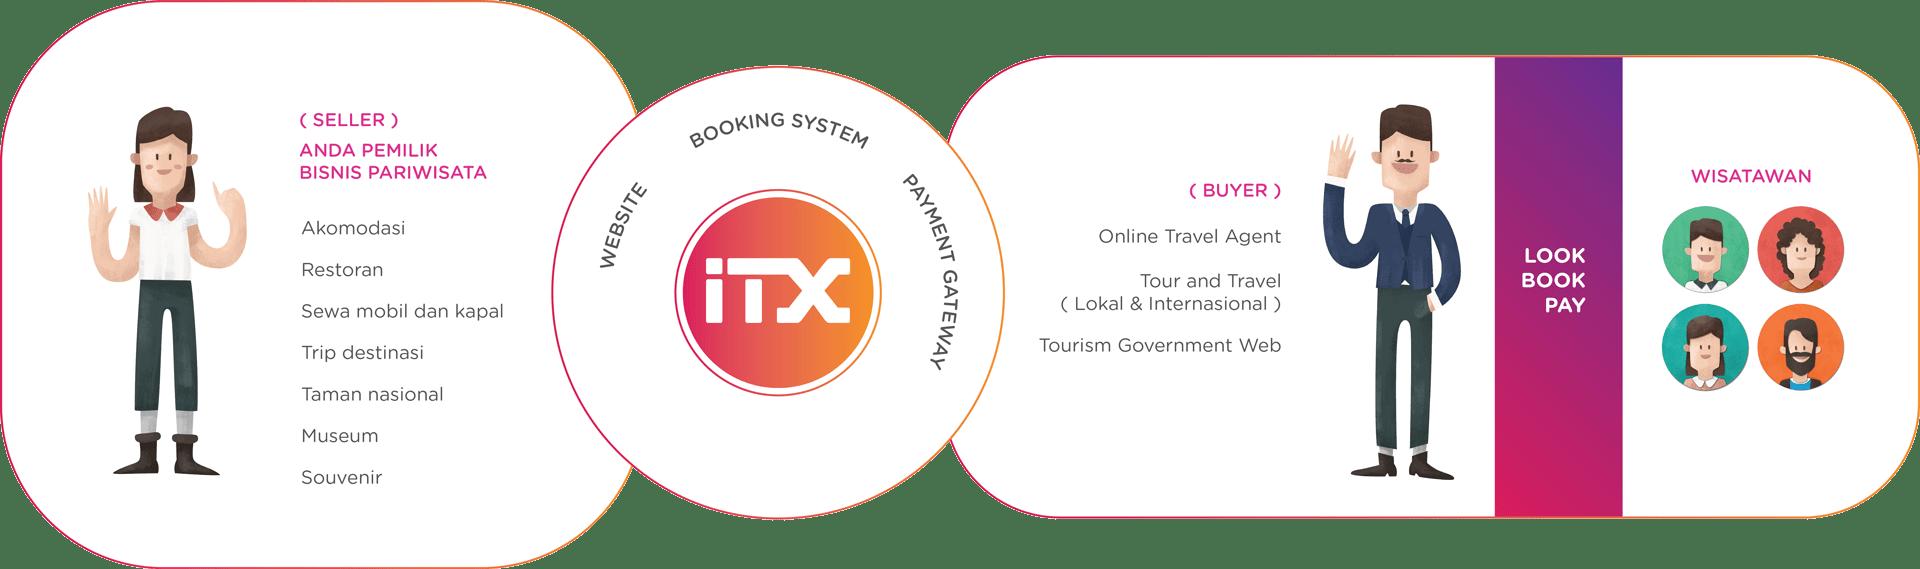 ITX_Illustration-3